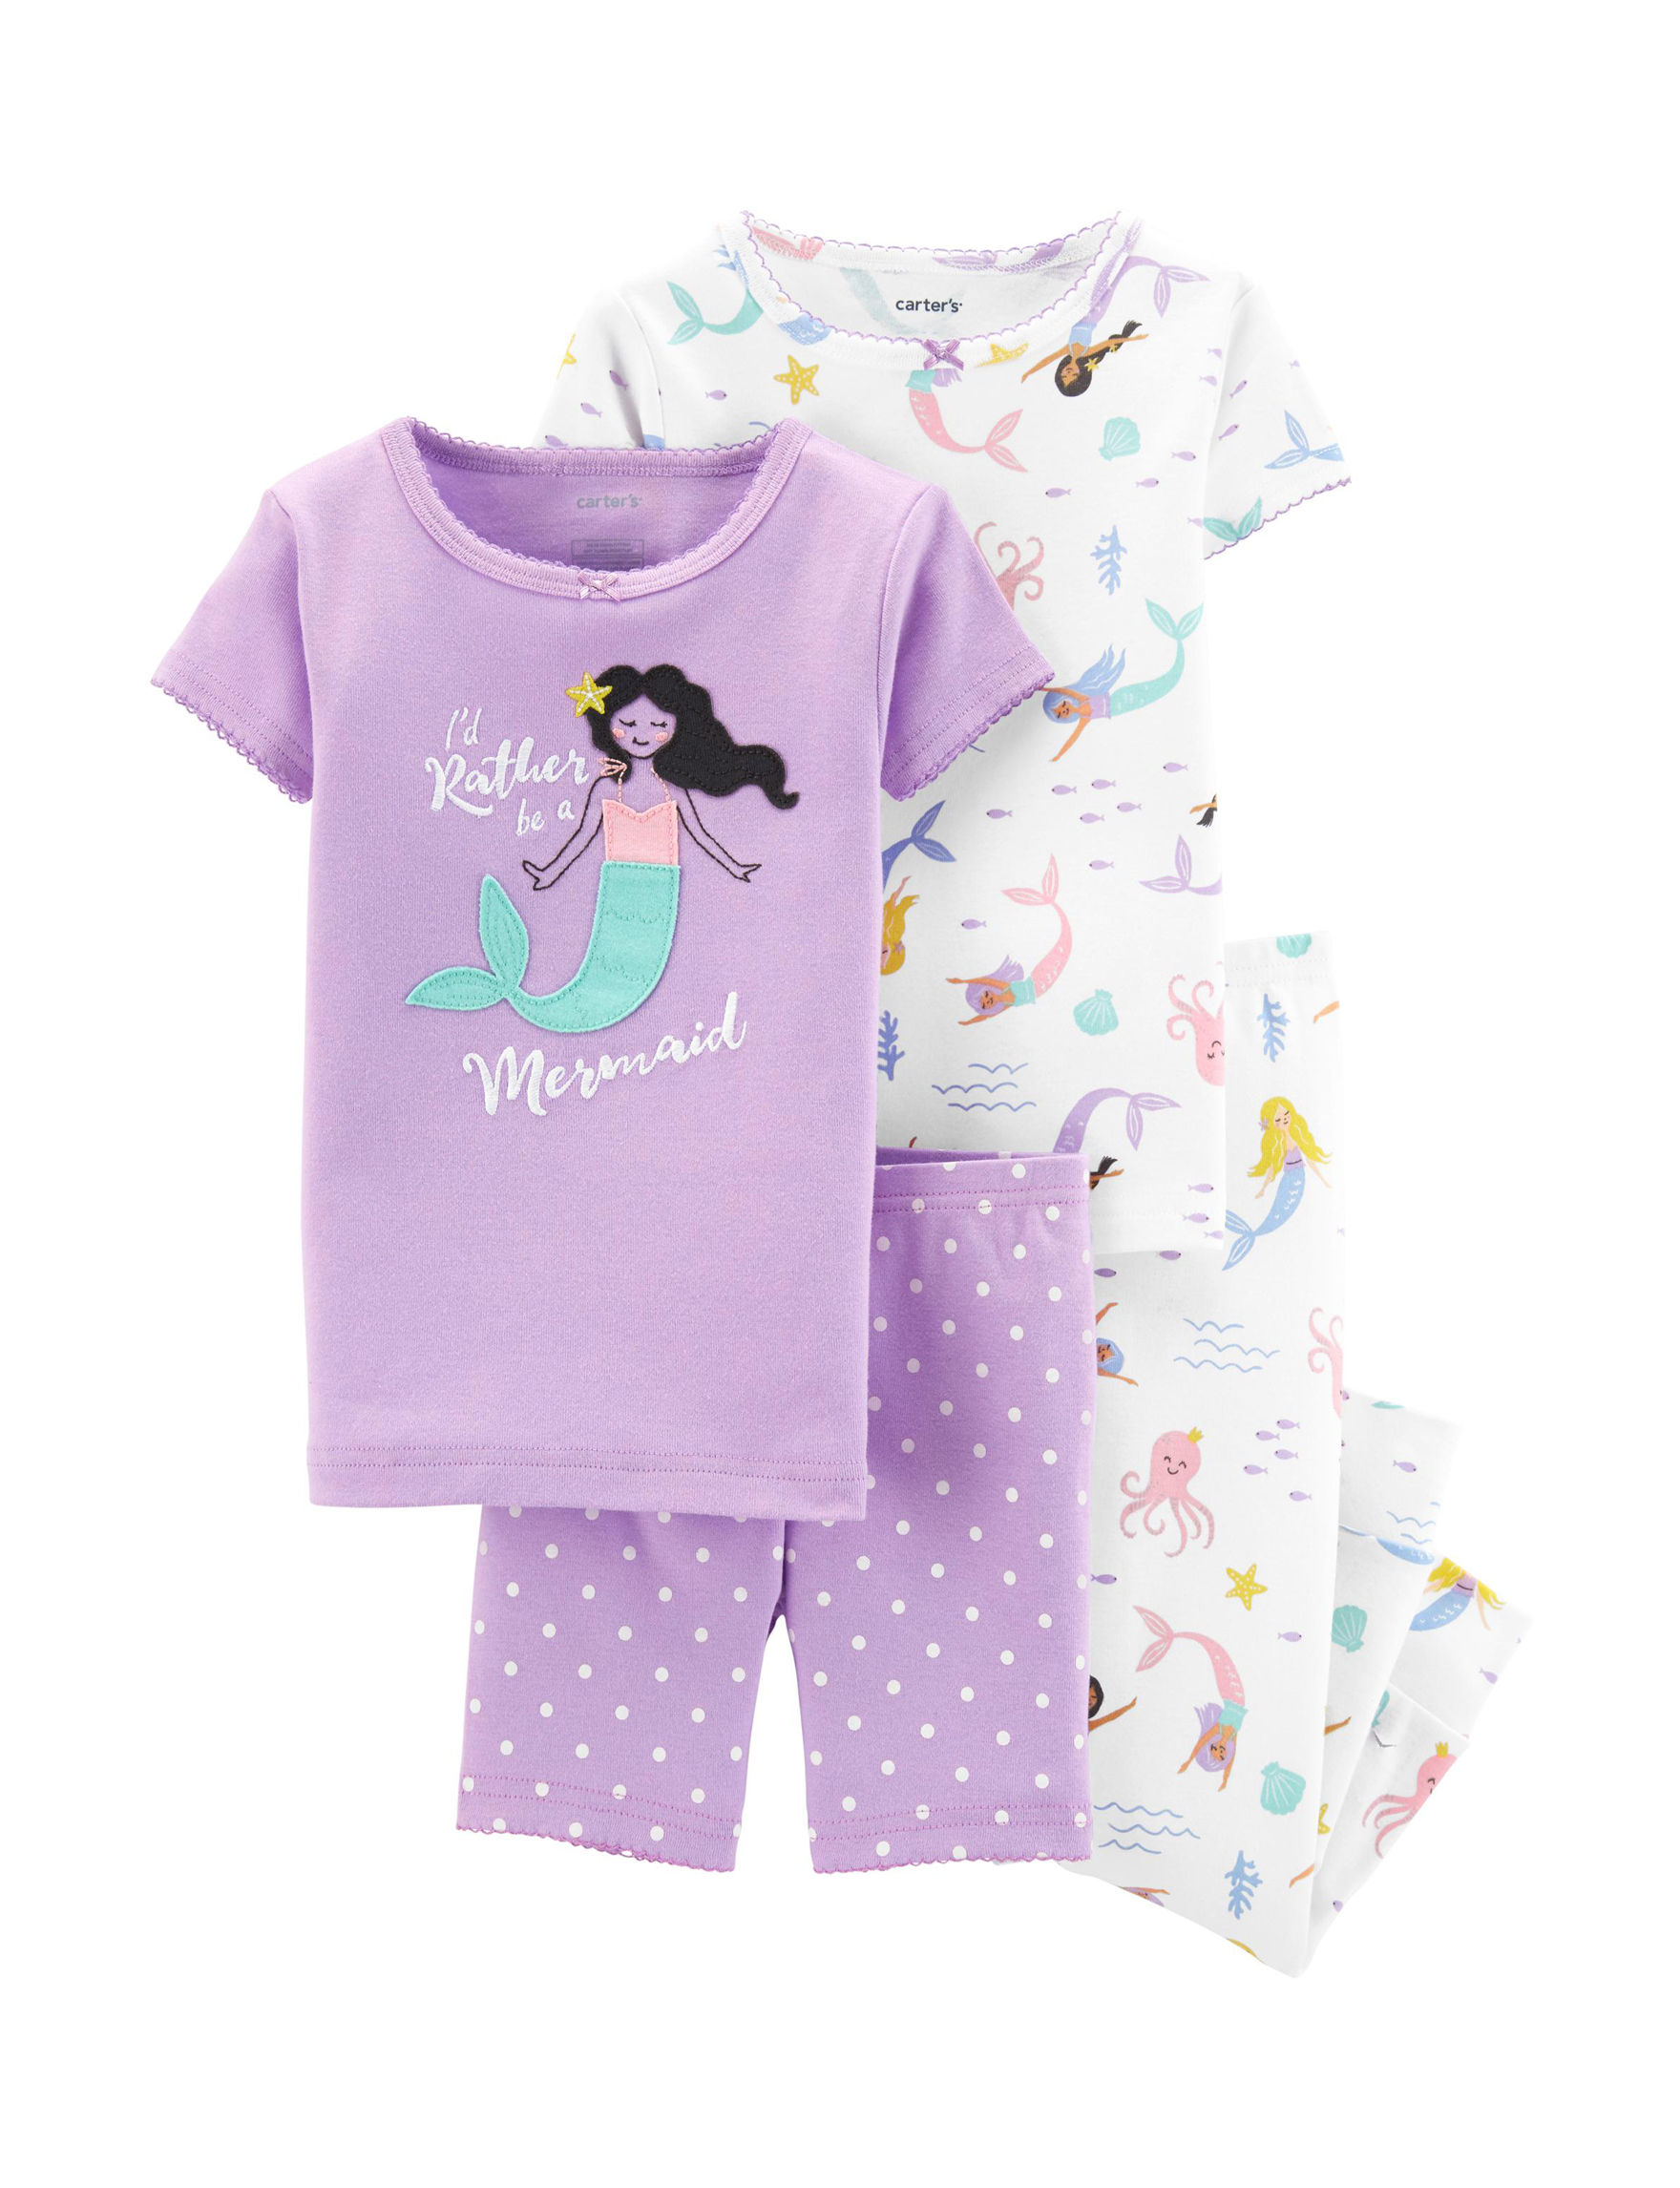 Carter's Purple / White Pajama Sets